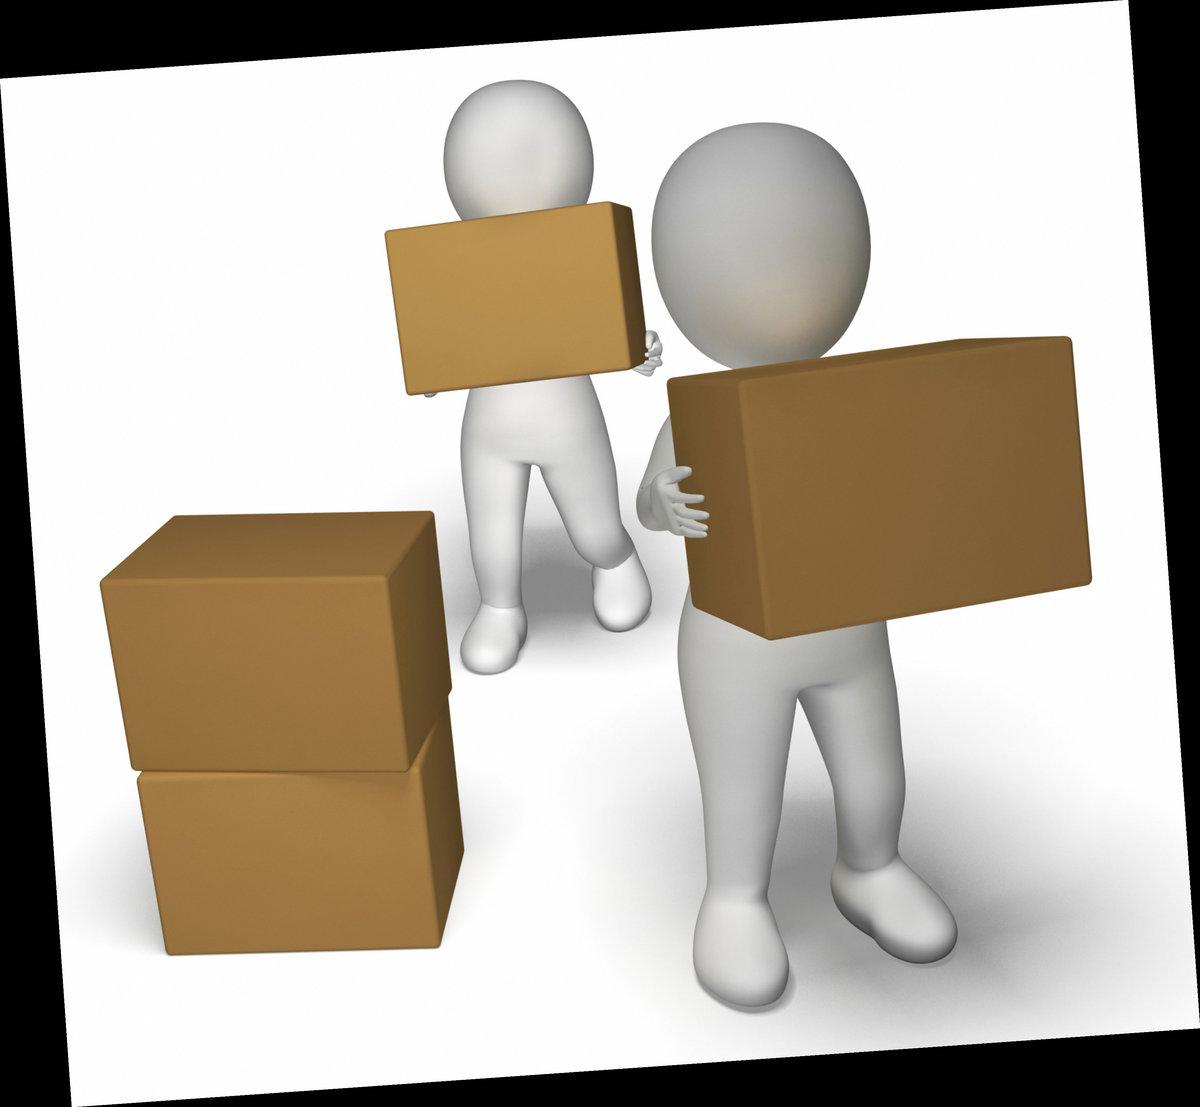 Furniture Moving Companies Escondido Ca Md Rick Thomas